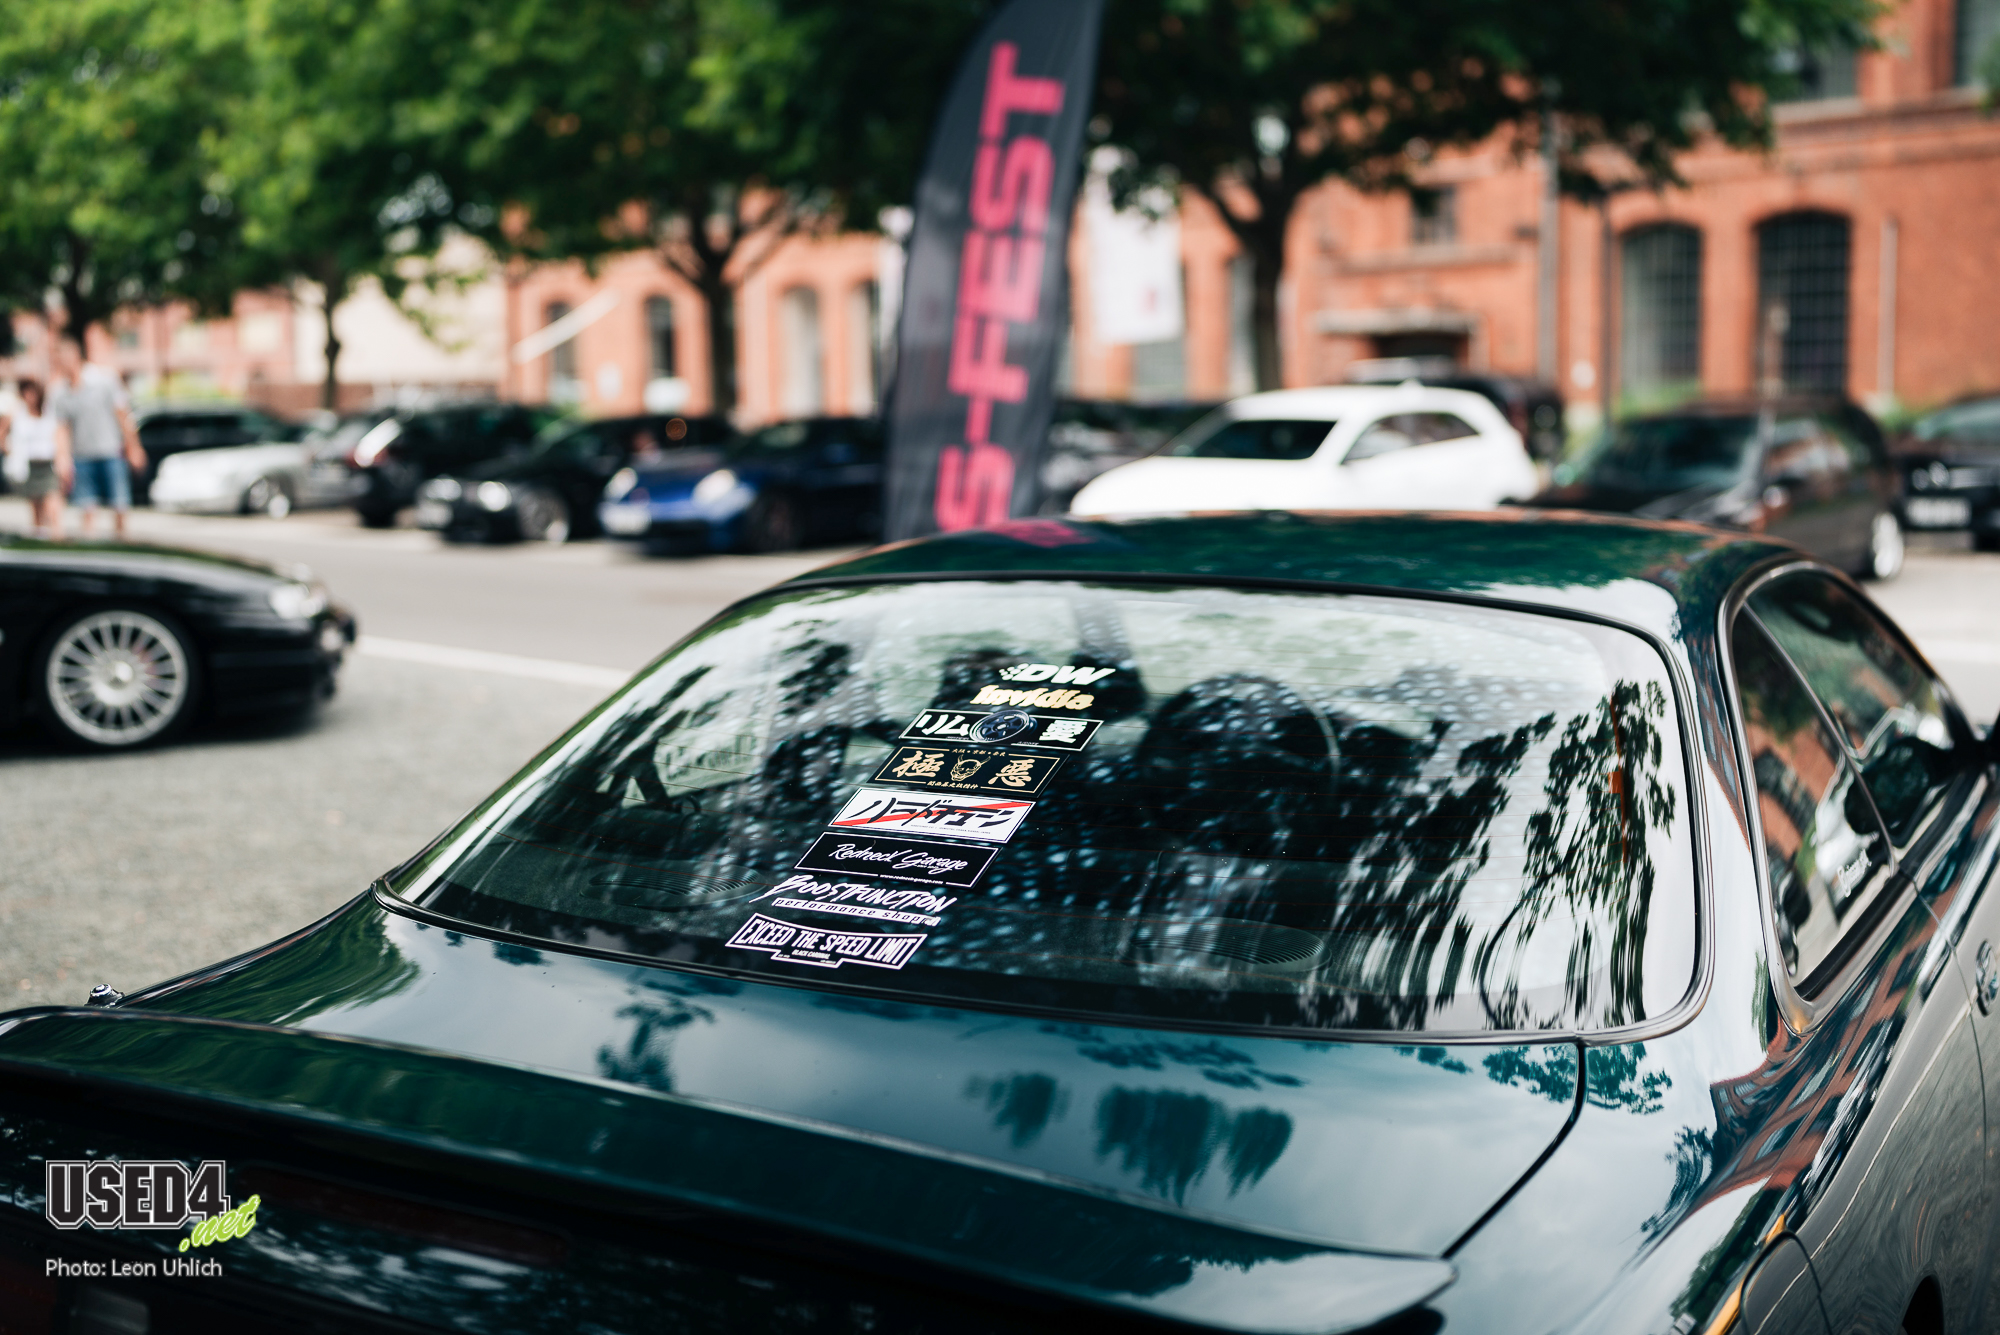 S-FEST 2020: Car Meets in Corona Times